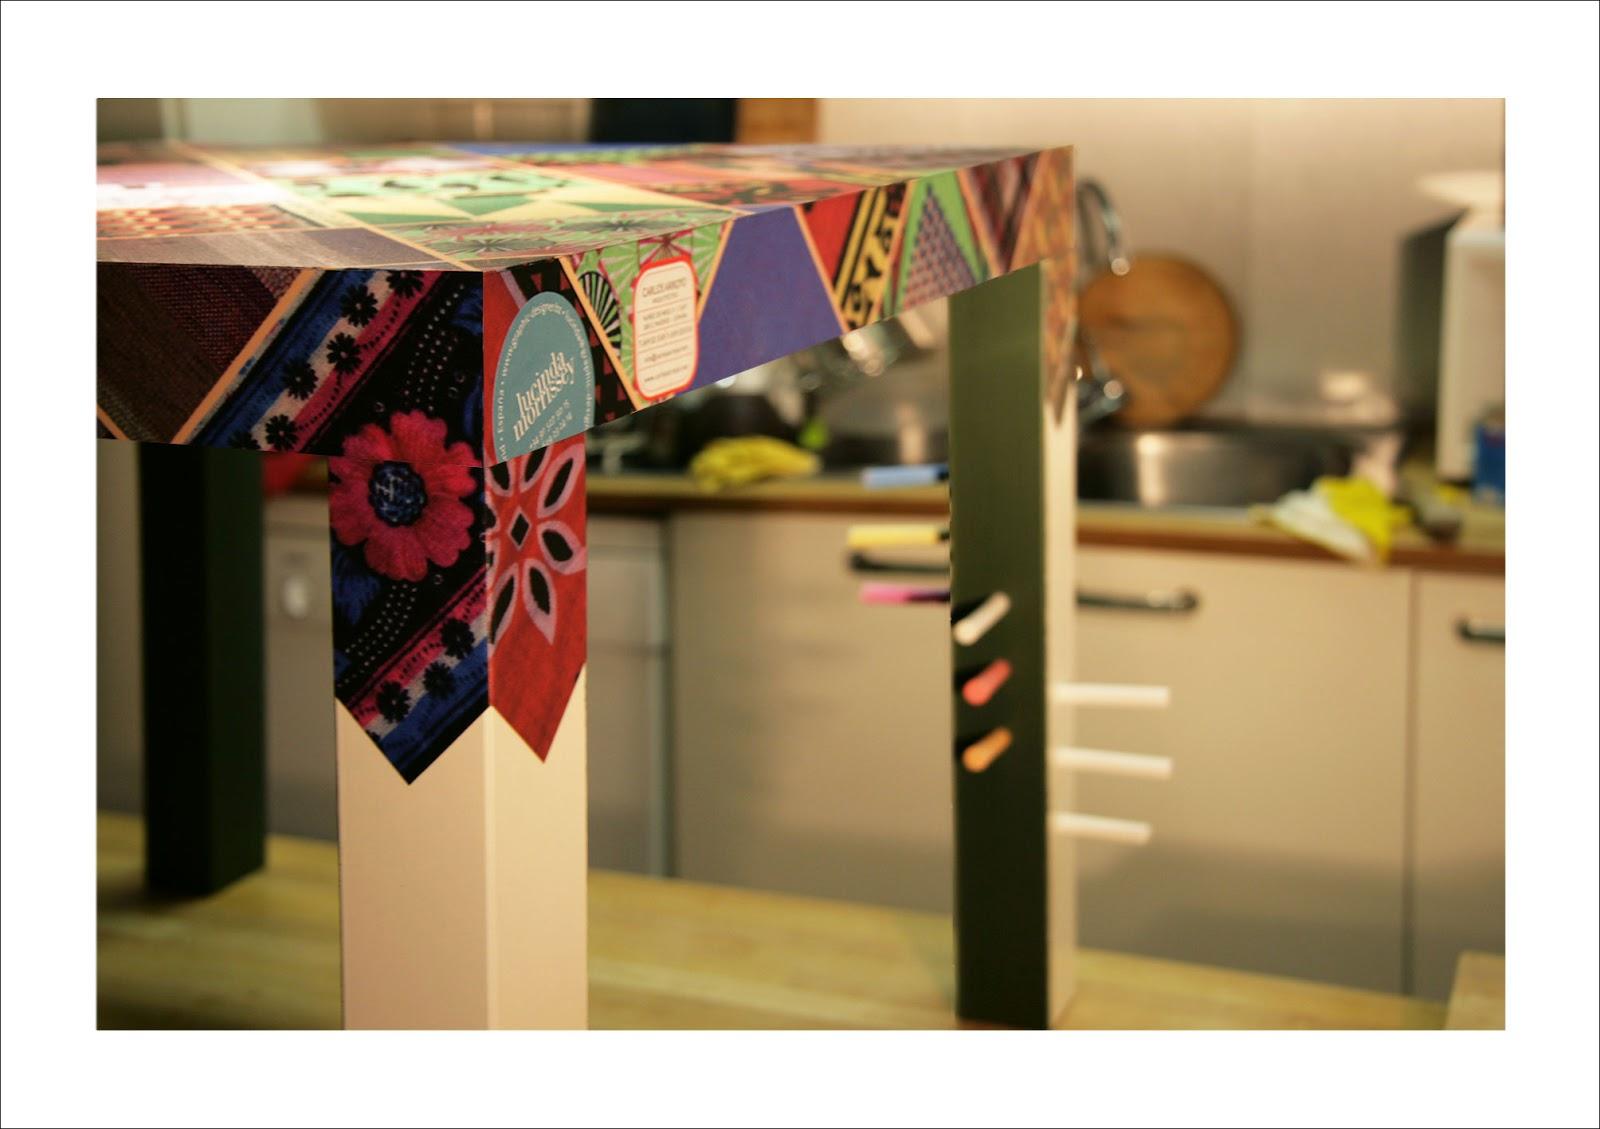 Graphic designer design lecturer translator researcher mesa ikea lots of lack for africa - Ikea mesas estudio ninos ...